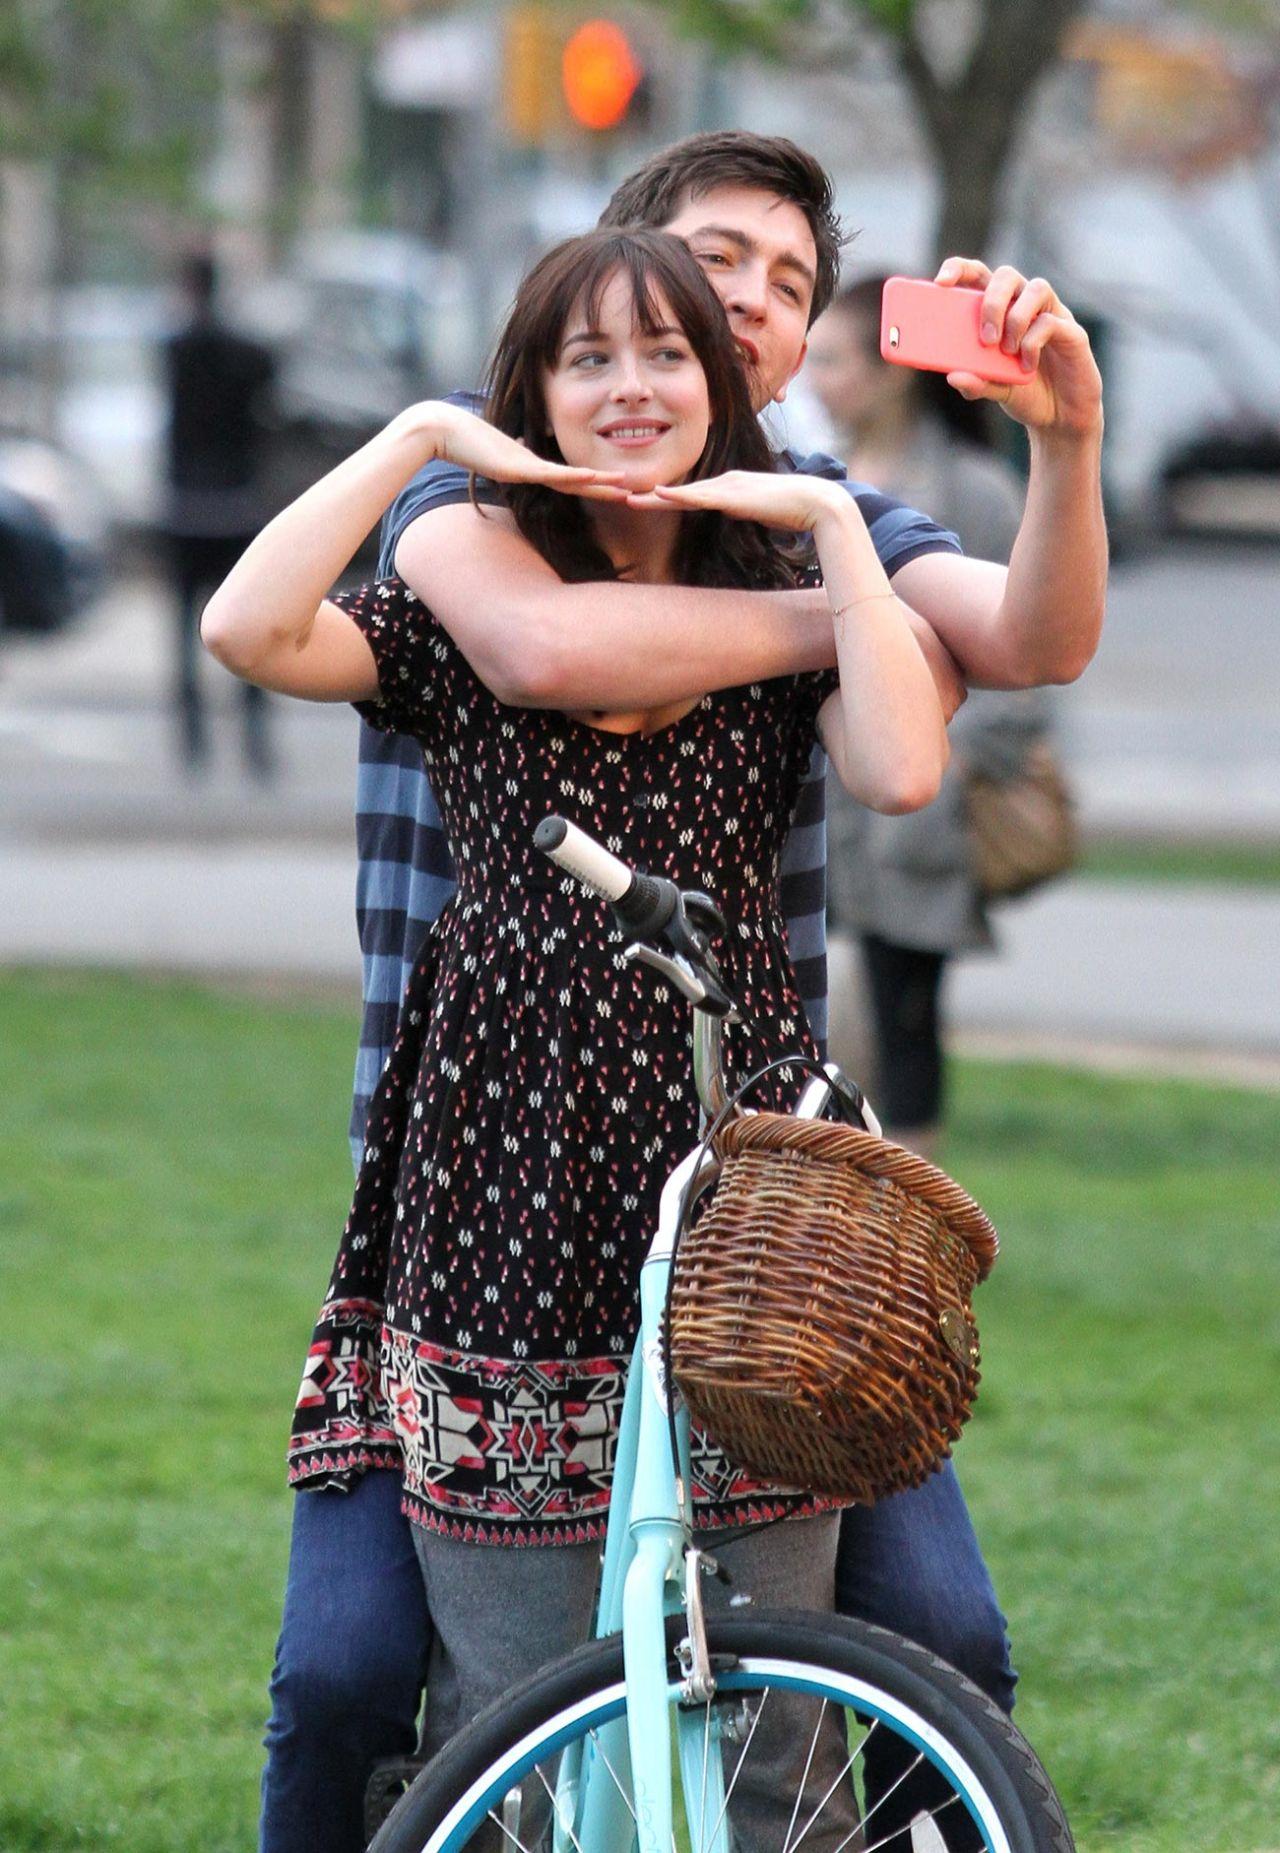 Dakota Johnson On Set Of Htbscel How To Be Happy Being Single Woman